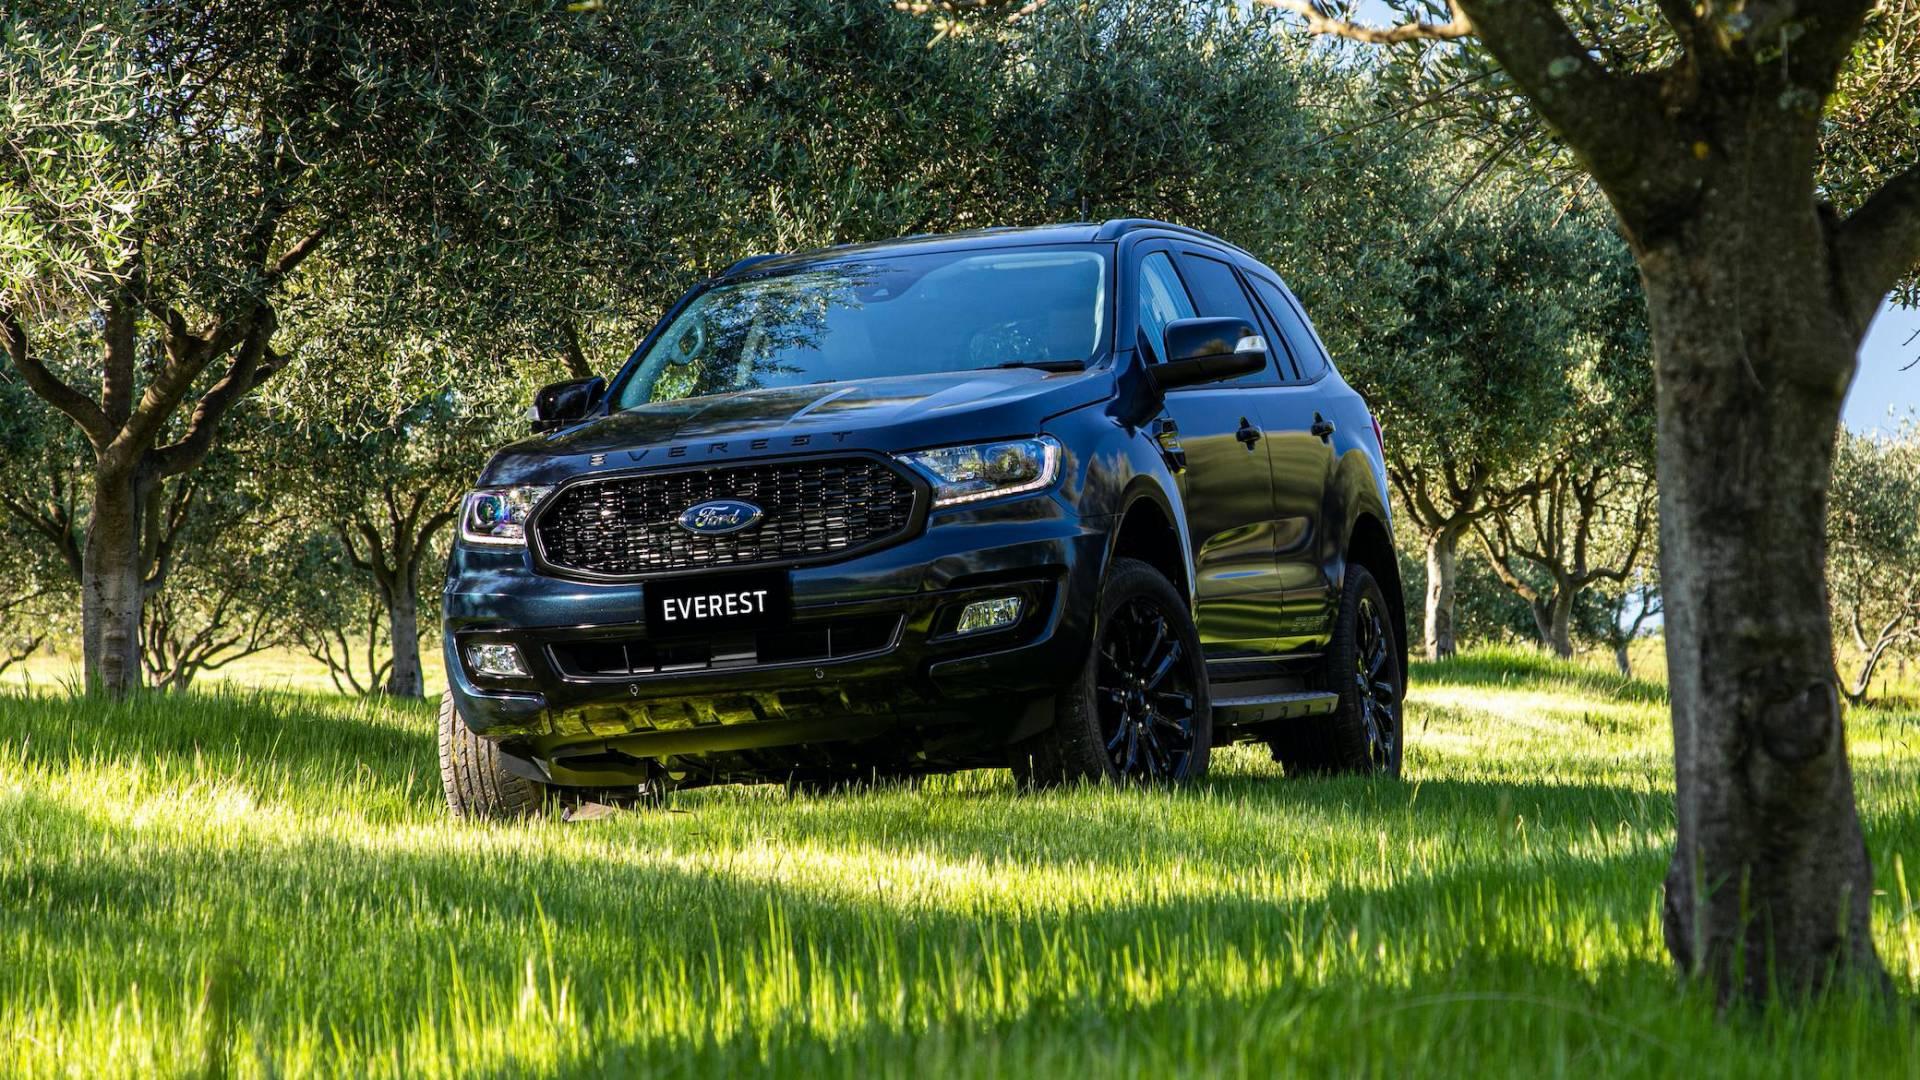 2021 ford everest sport australia spec 4 - Chi tiết Ford Everest Sport 2021 – Phiên bản thể thao cho phái mạnh